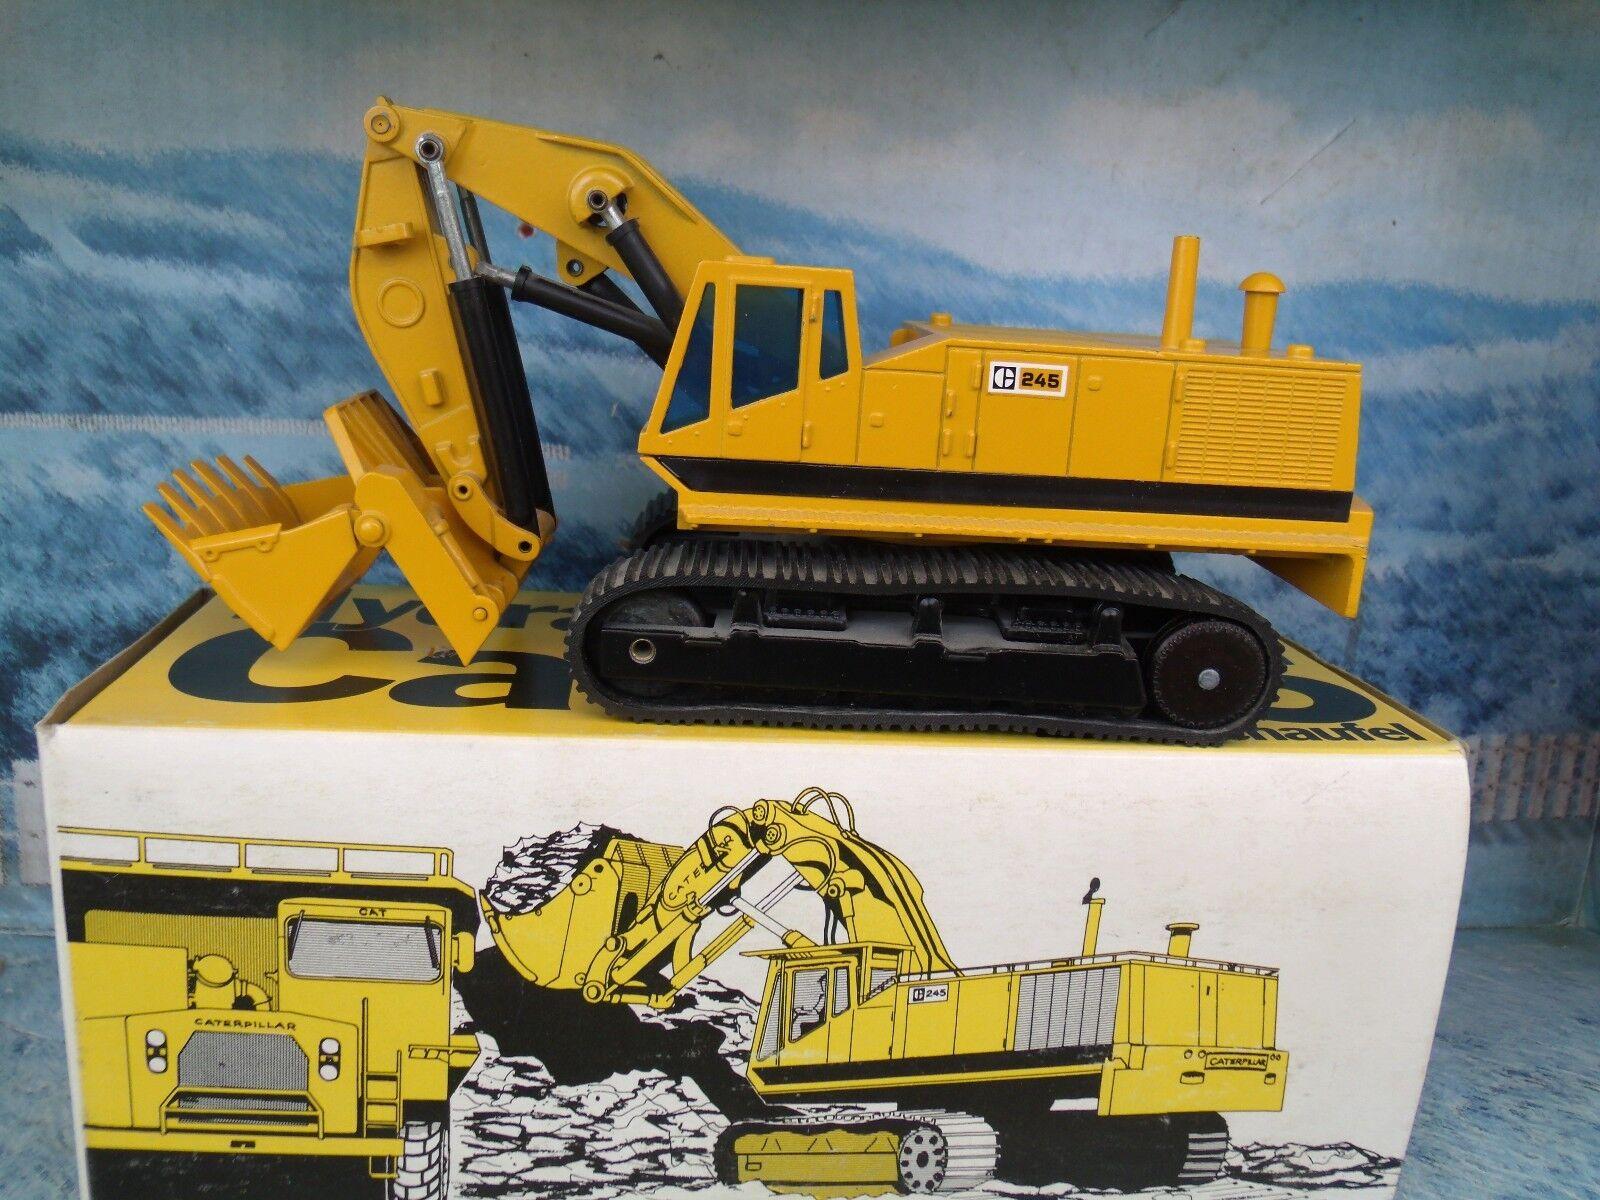 1 50 NZG (ALLEMAGNE) Caterpillar Excavateur hydraulique avant Pelle 245  177